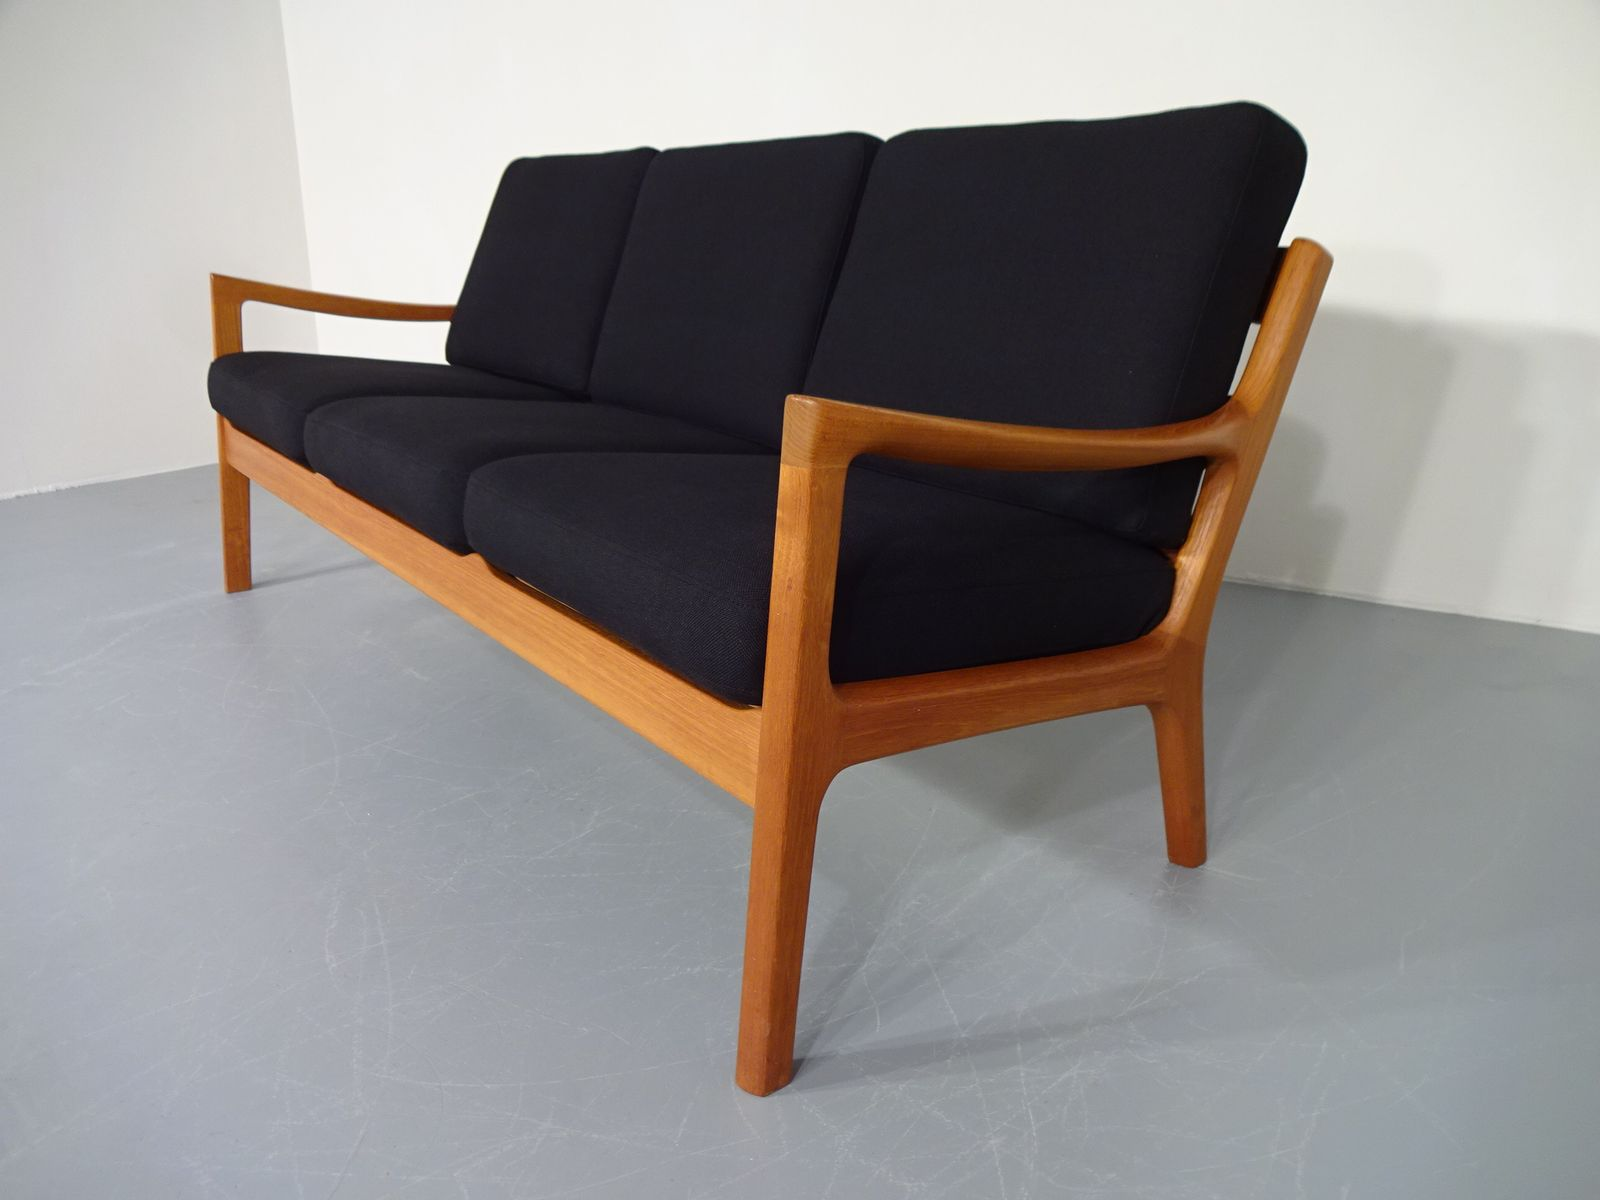 teakholz sofa von ole wanscher f r cado 1960er bei pamono kaufen. Black Bedroom Furniture Sets. Home Design Ideas